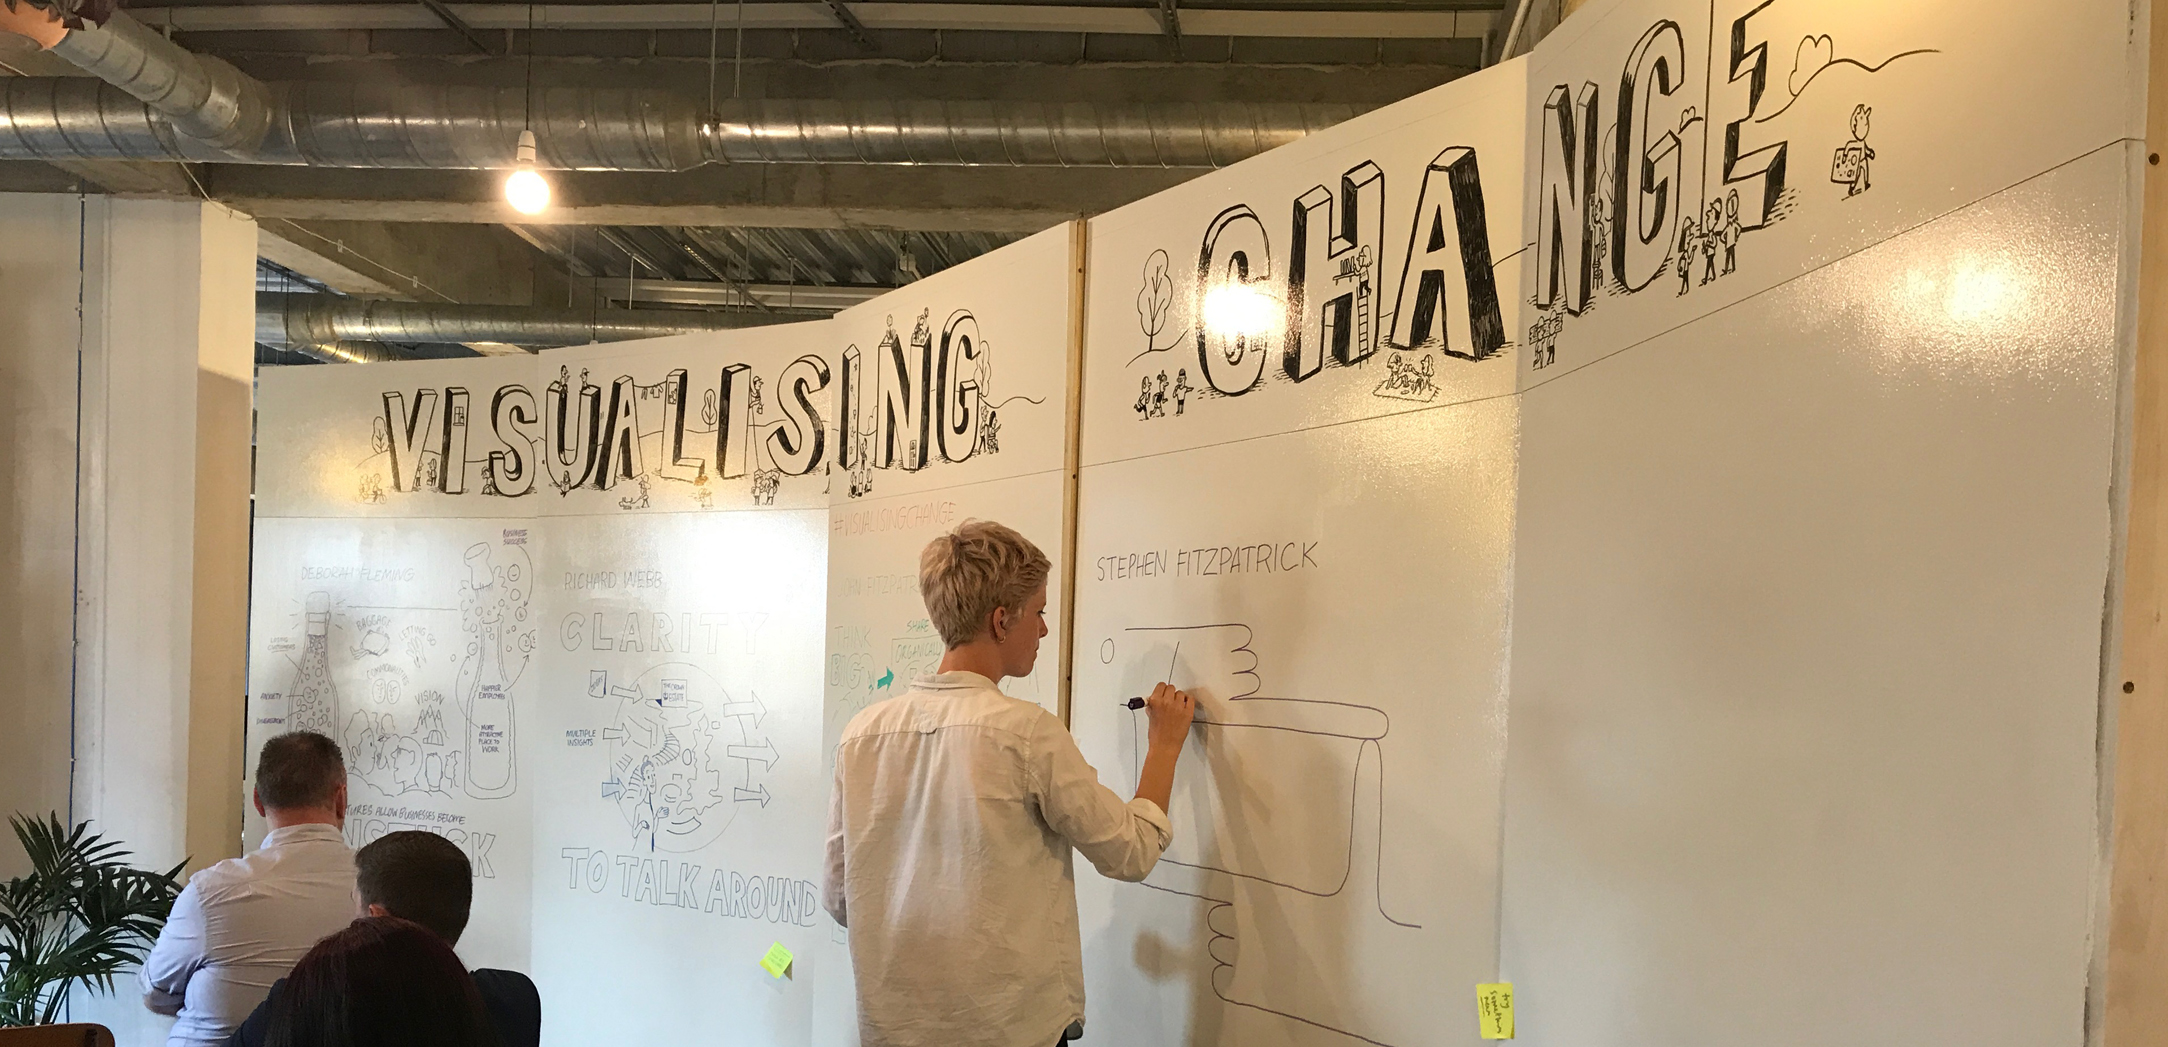 Scribing is a mirror  - Deborah Fleming, Chameleon Works